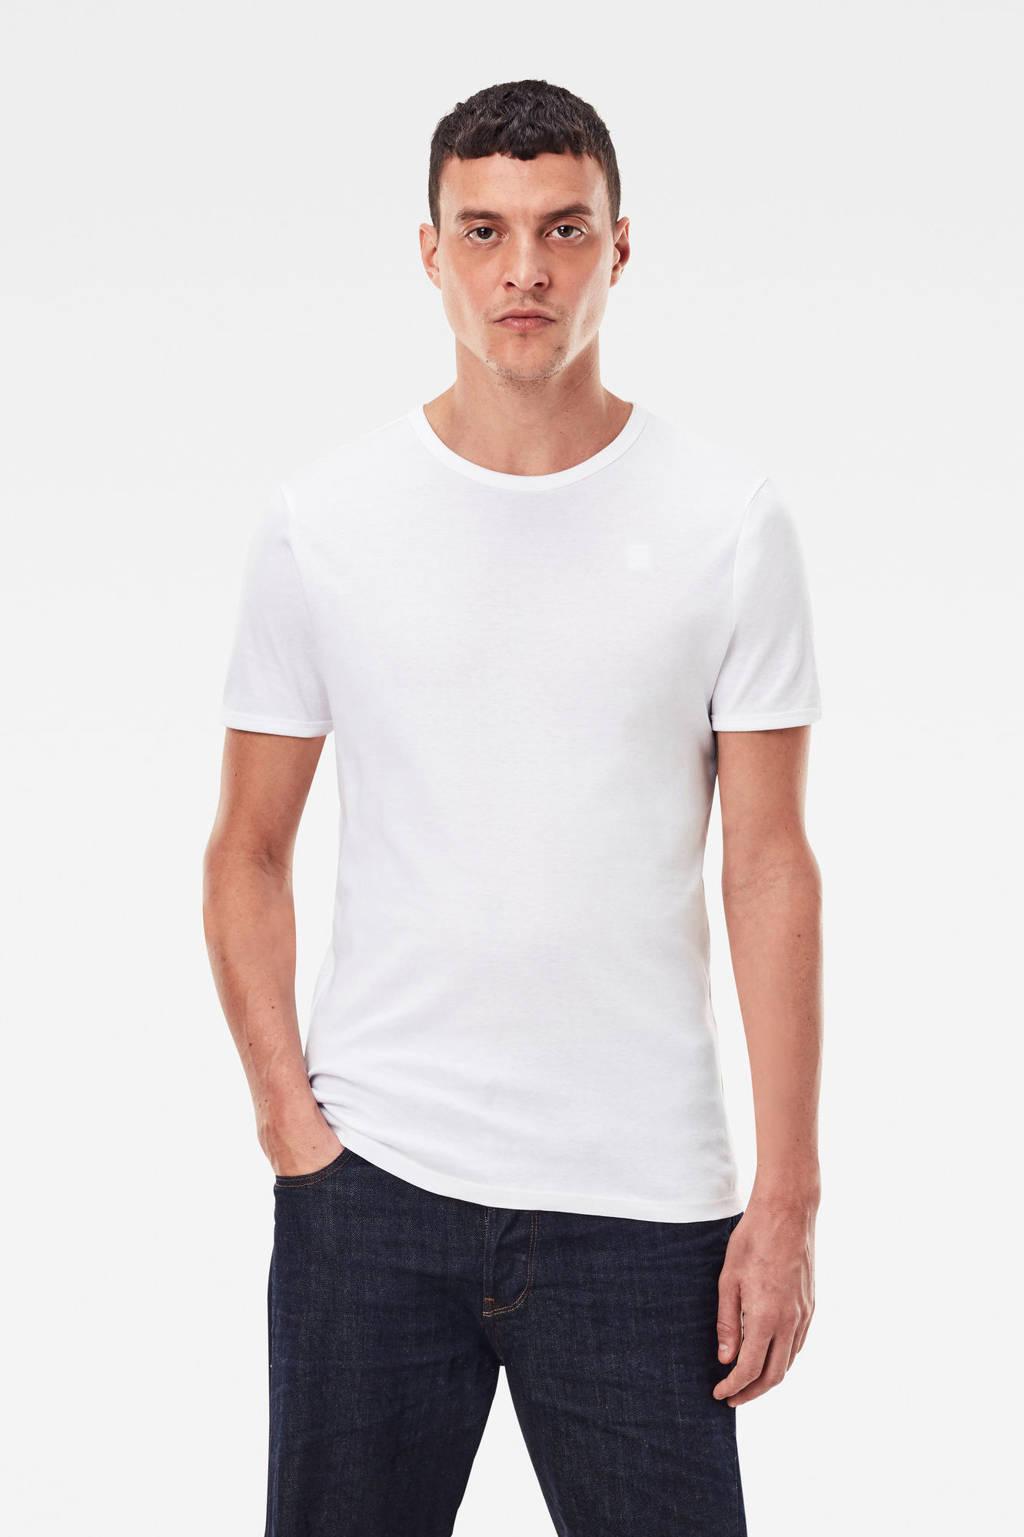 G-Star RAW Base T-shirt (set van 2), Wit